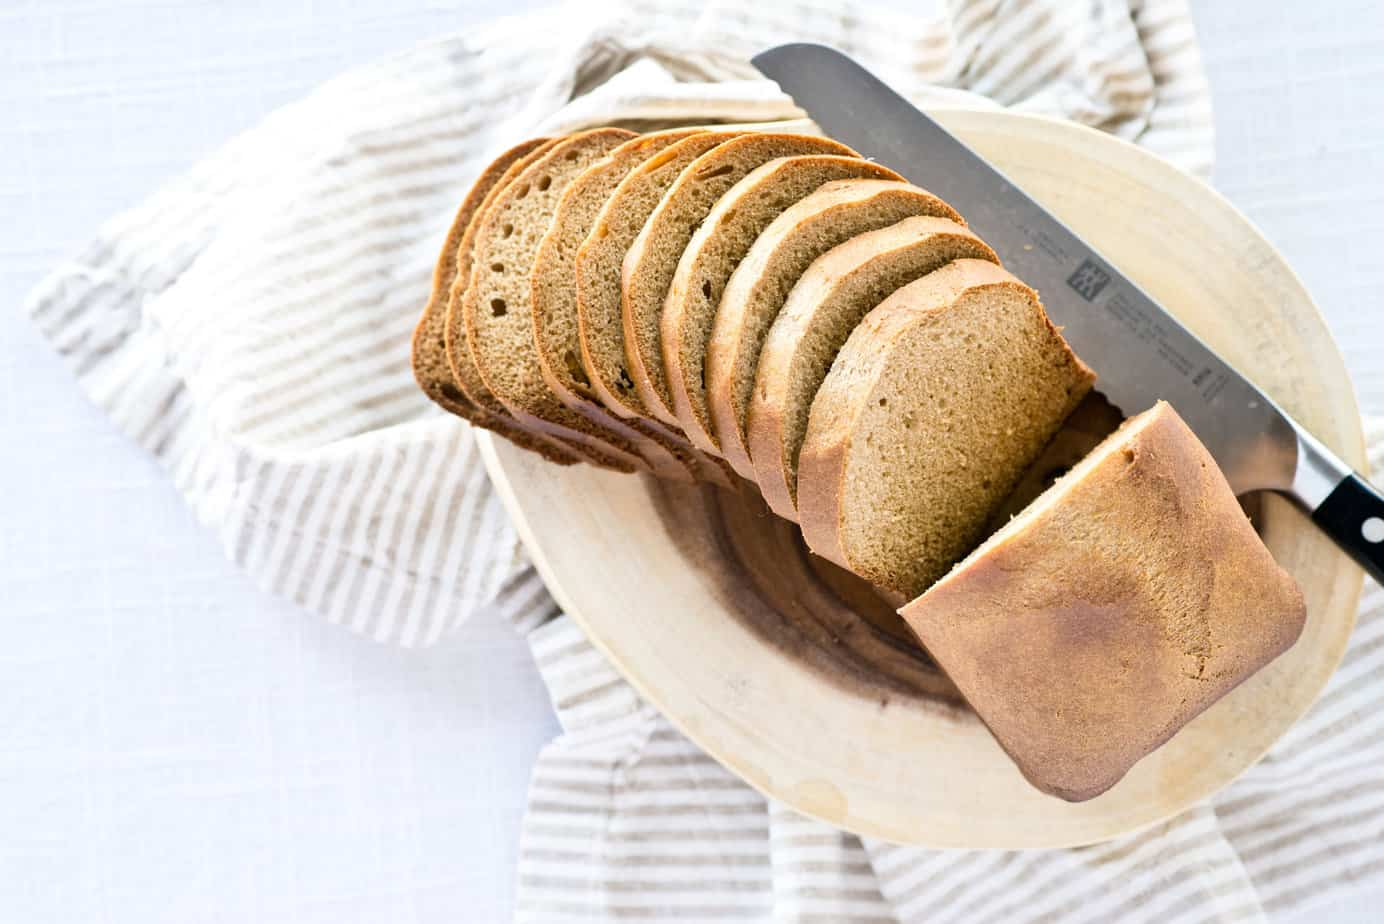 Legit Bread Co